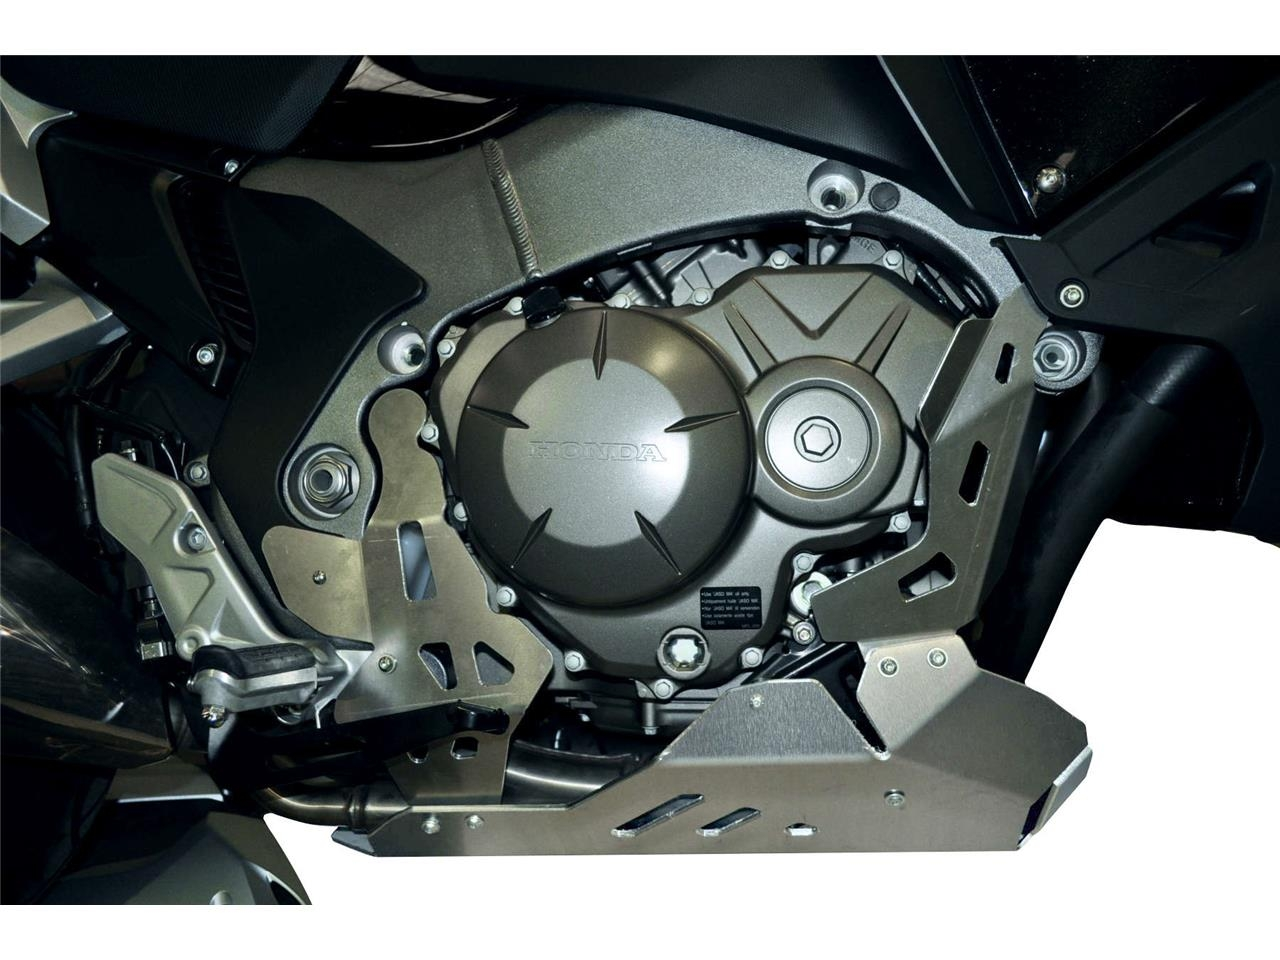 Sabot moteur Bihr aluminium gris pour Honda Crosstourer 1200 12-14